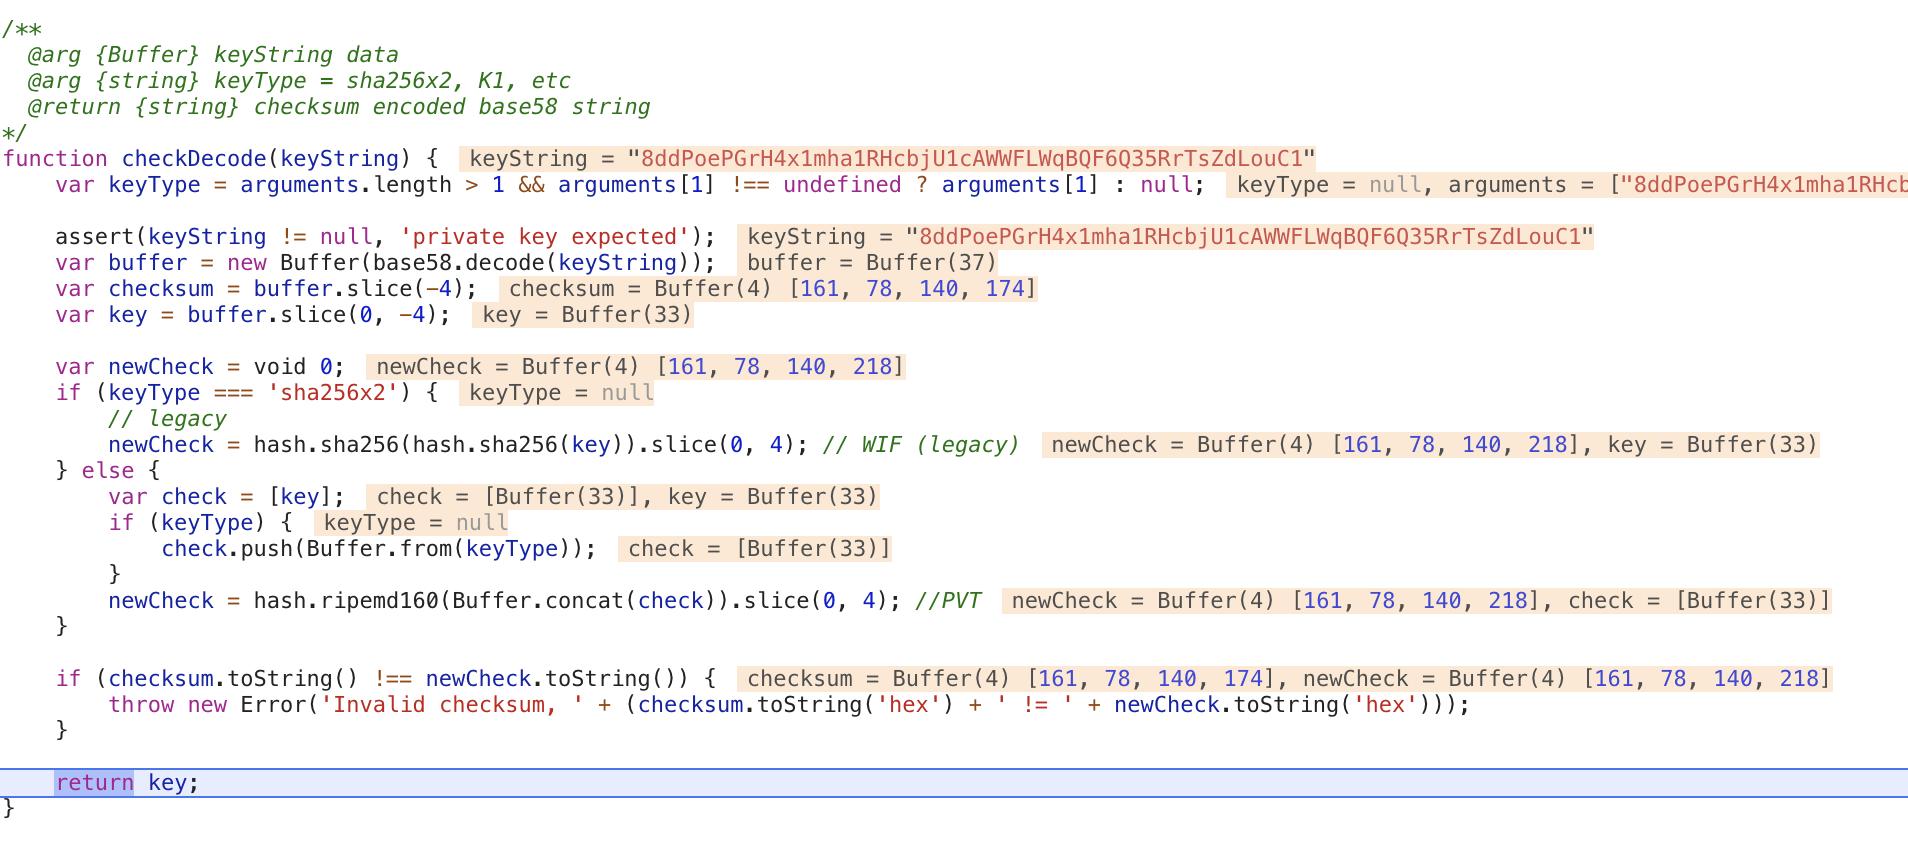 checkDecode has incorrect checksum check · Issue #37 · EOSIO